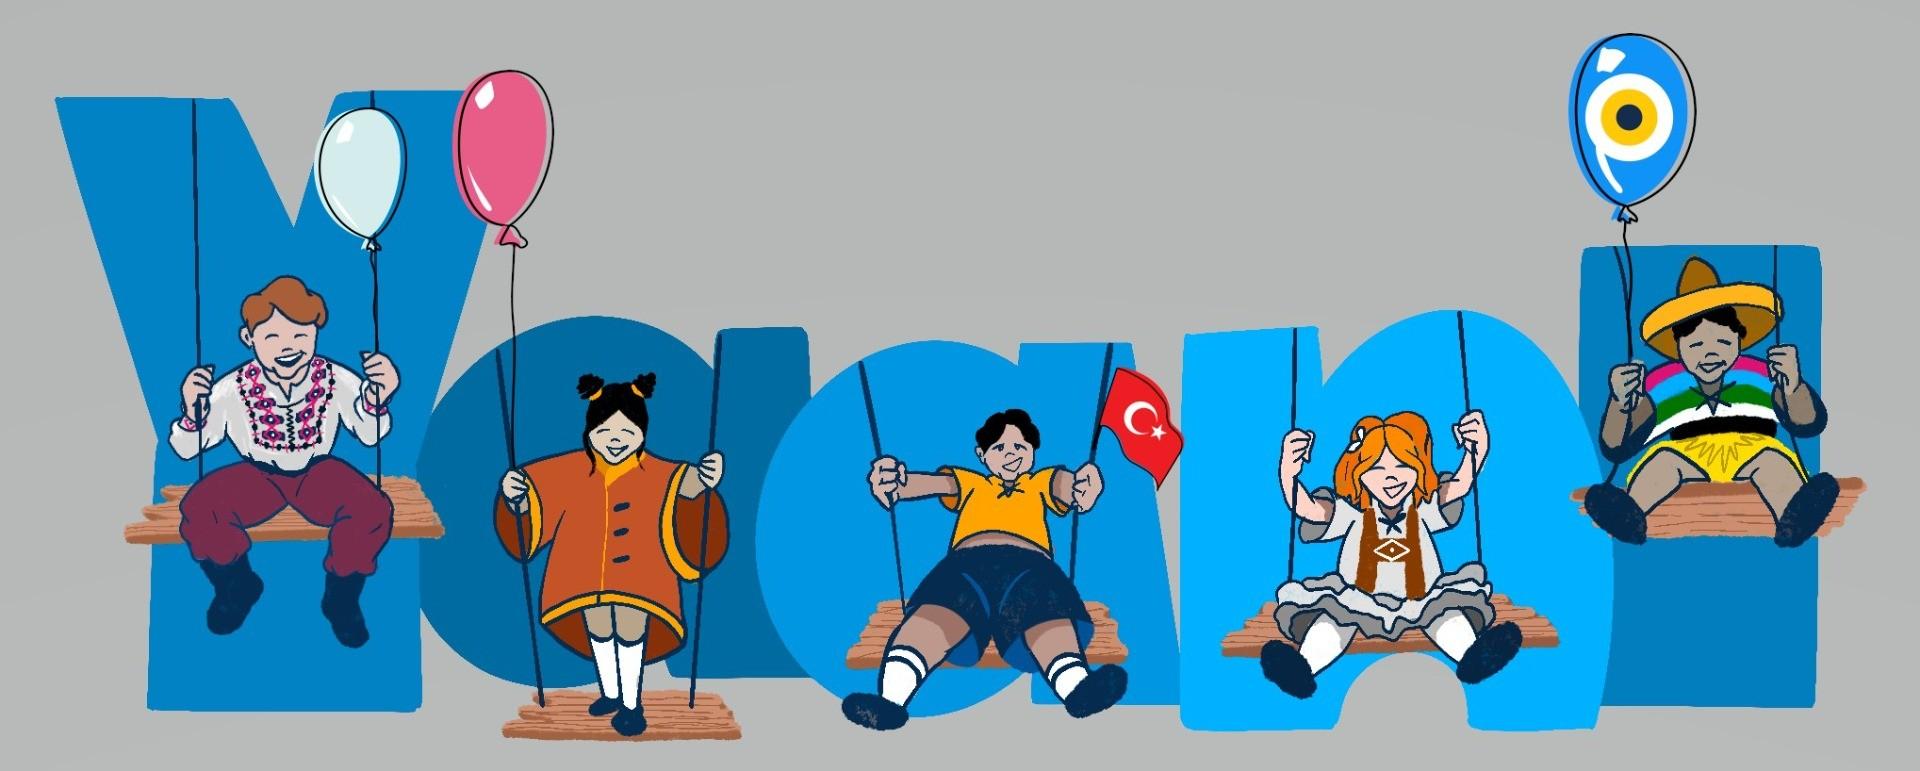 Yaani'den 23 Nisan'a özel gün logosu